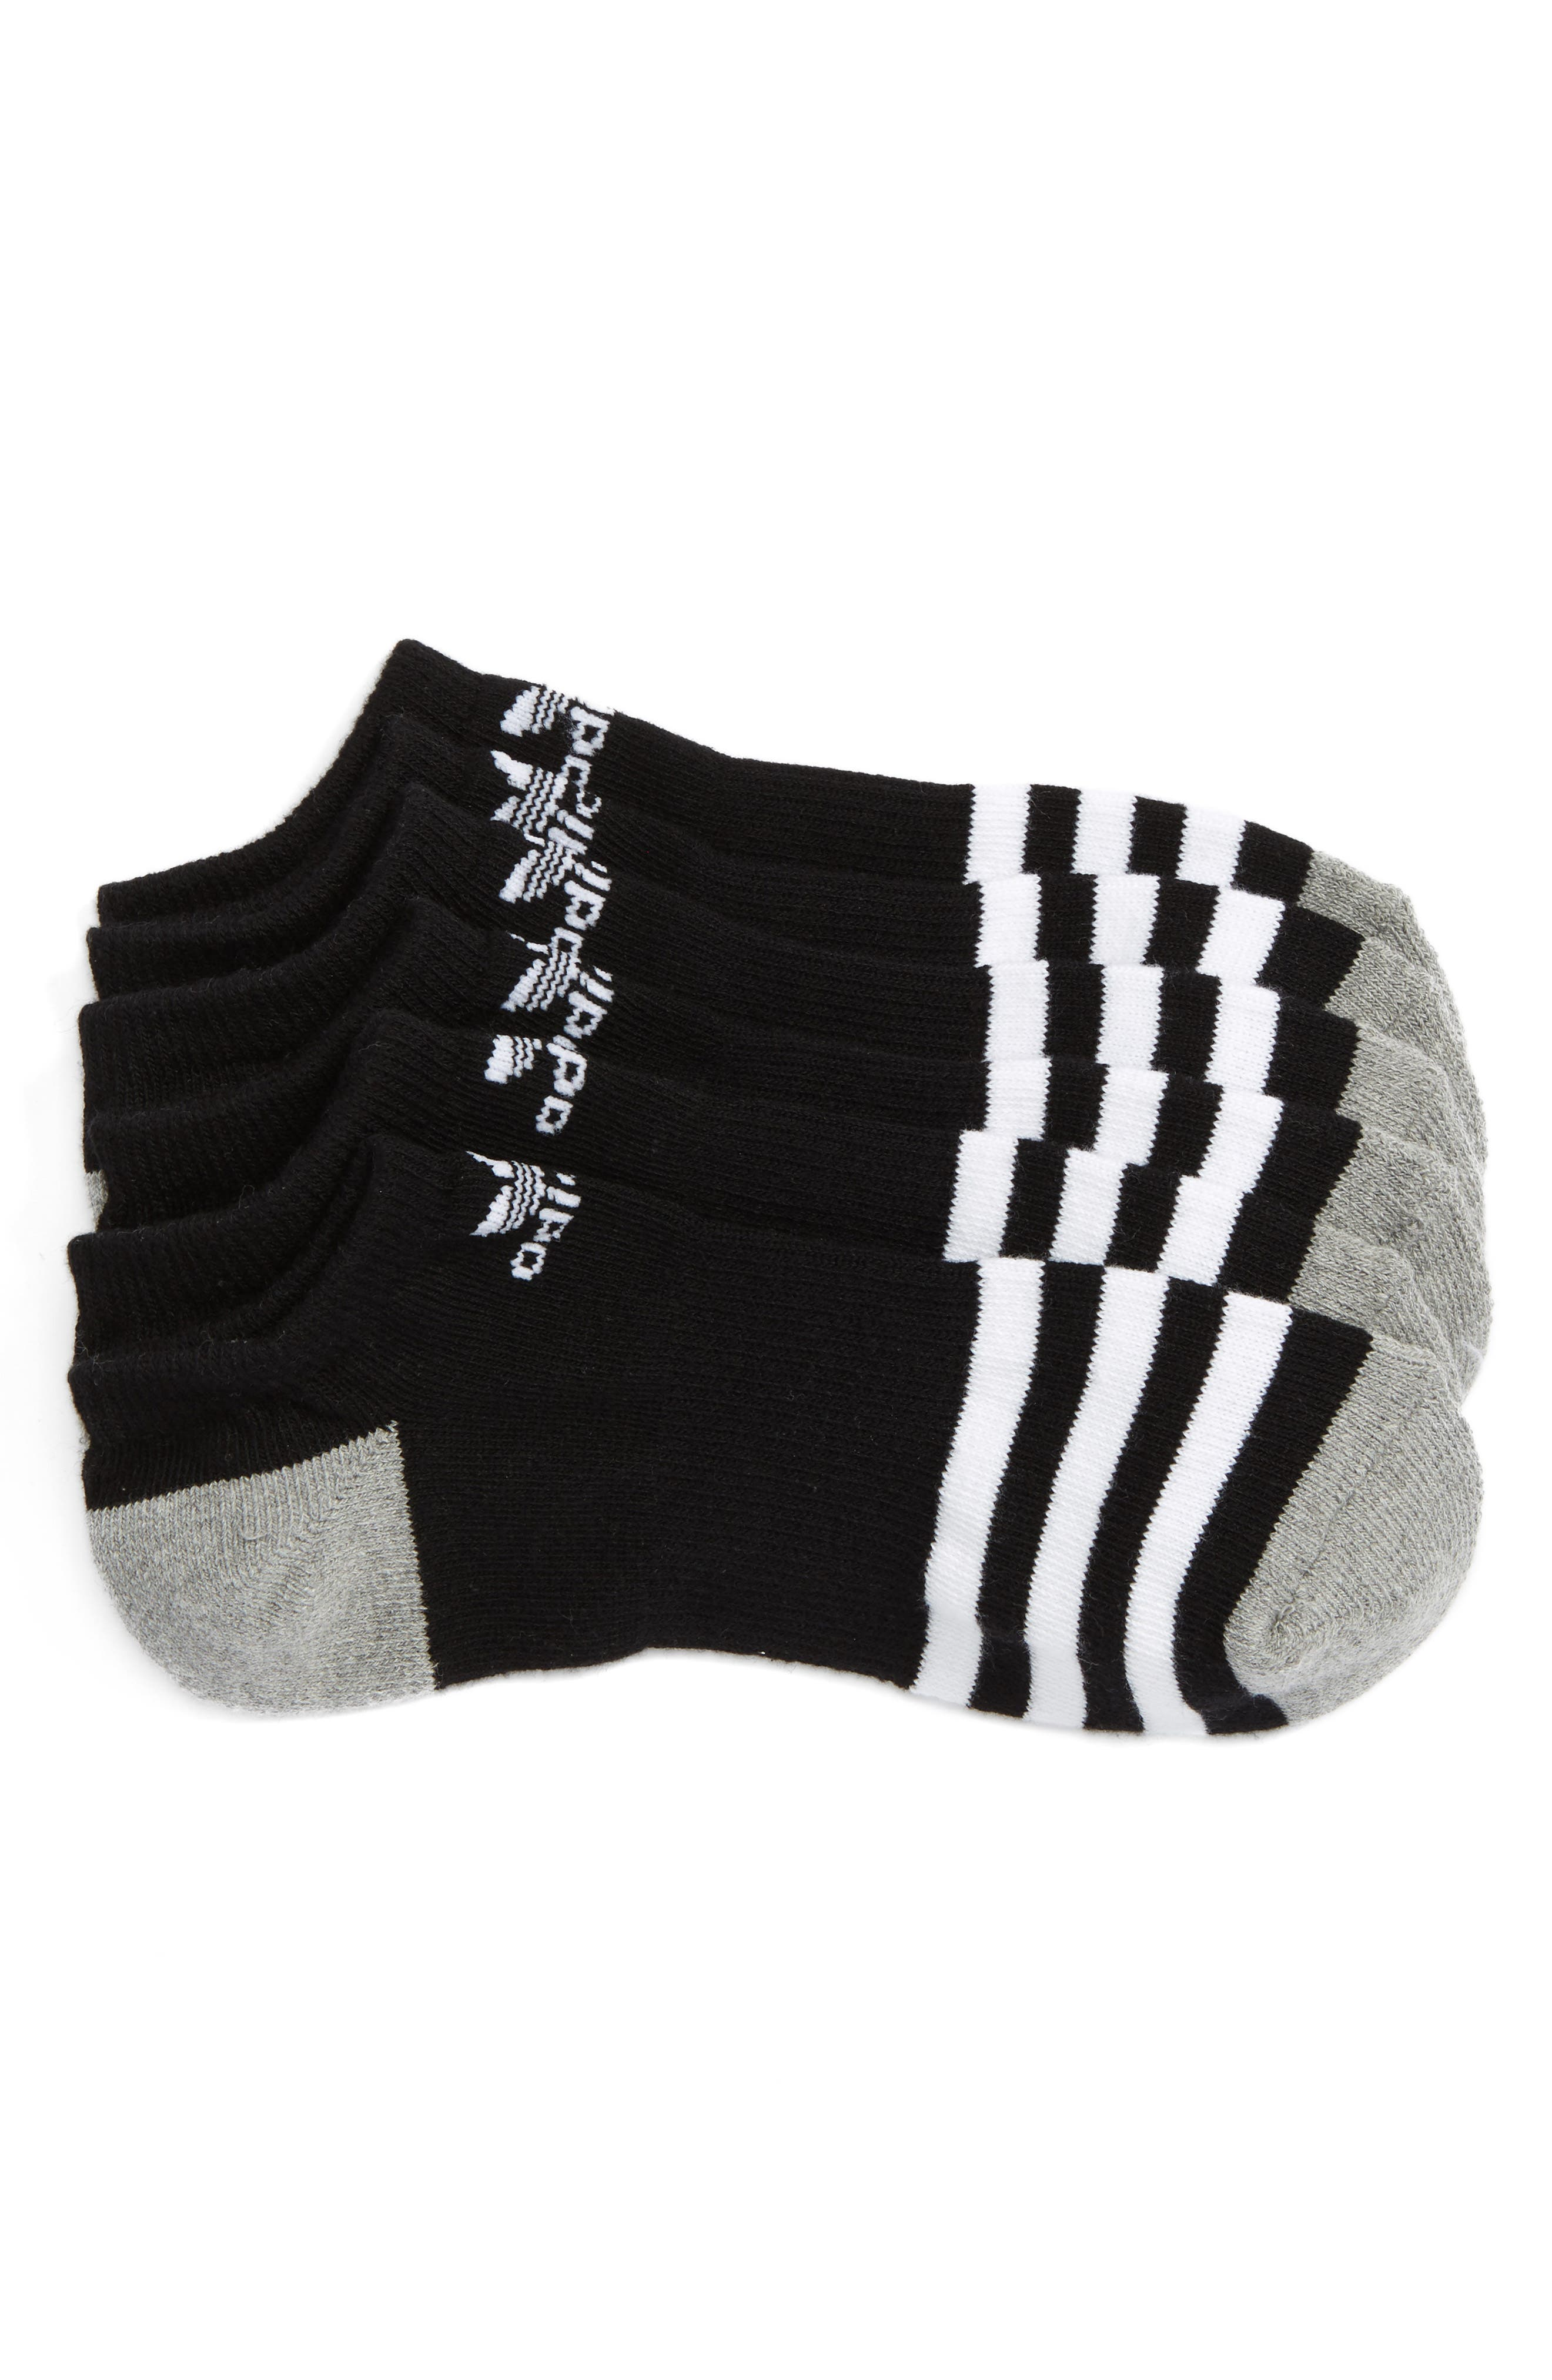 3-Pack Original Cushioned No-Show Socks,                             Main thumbnail 1, color,                             BLACK/ WHITE/ BLACK